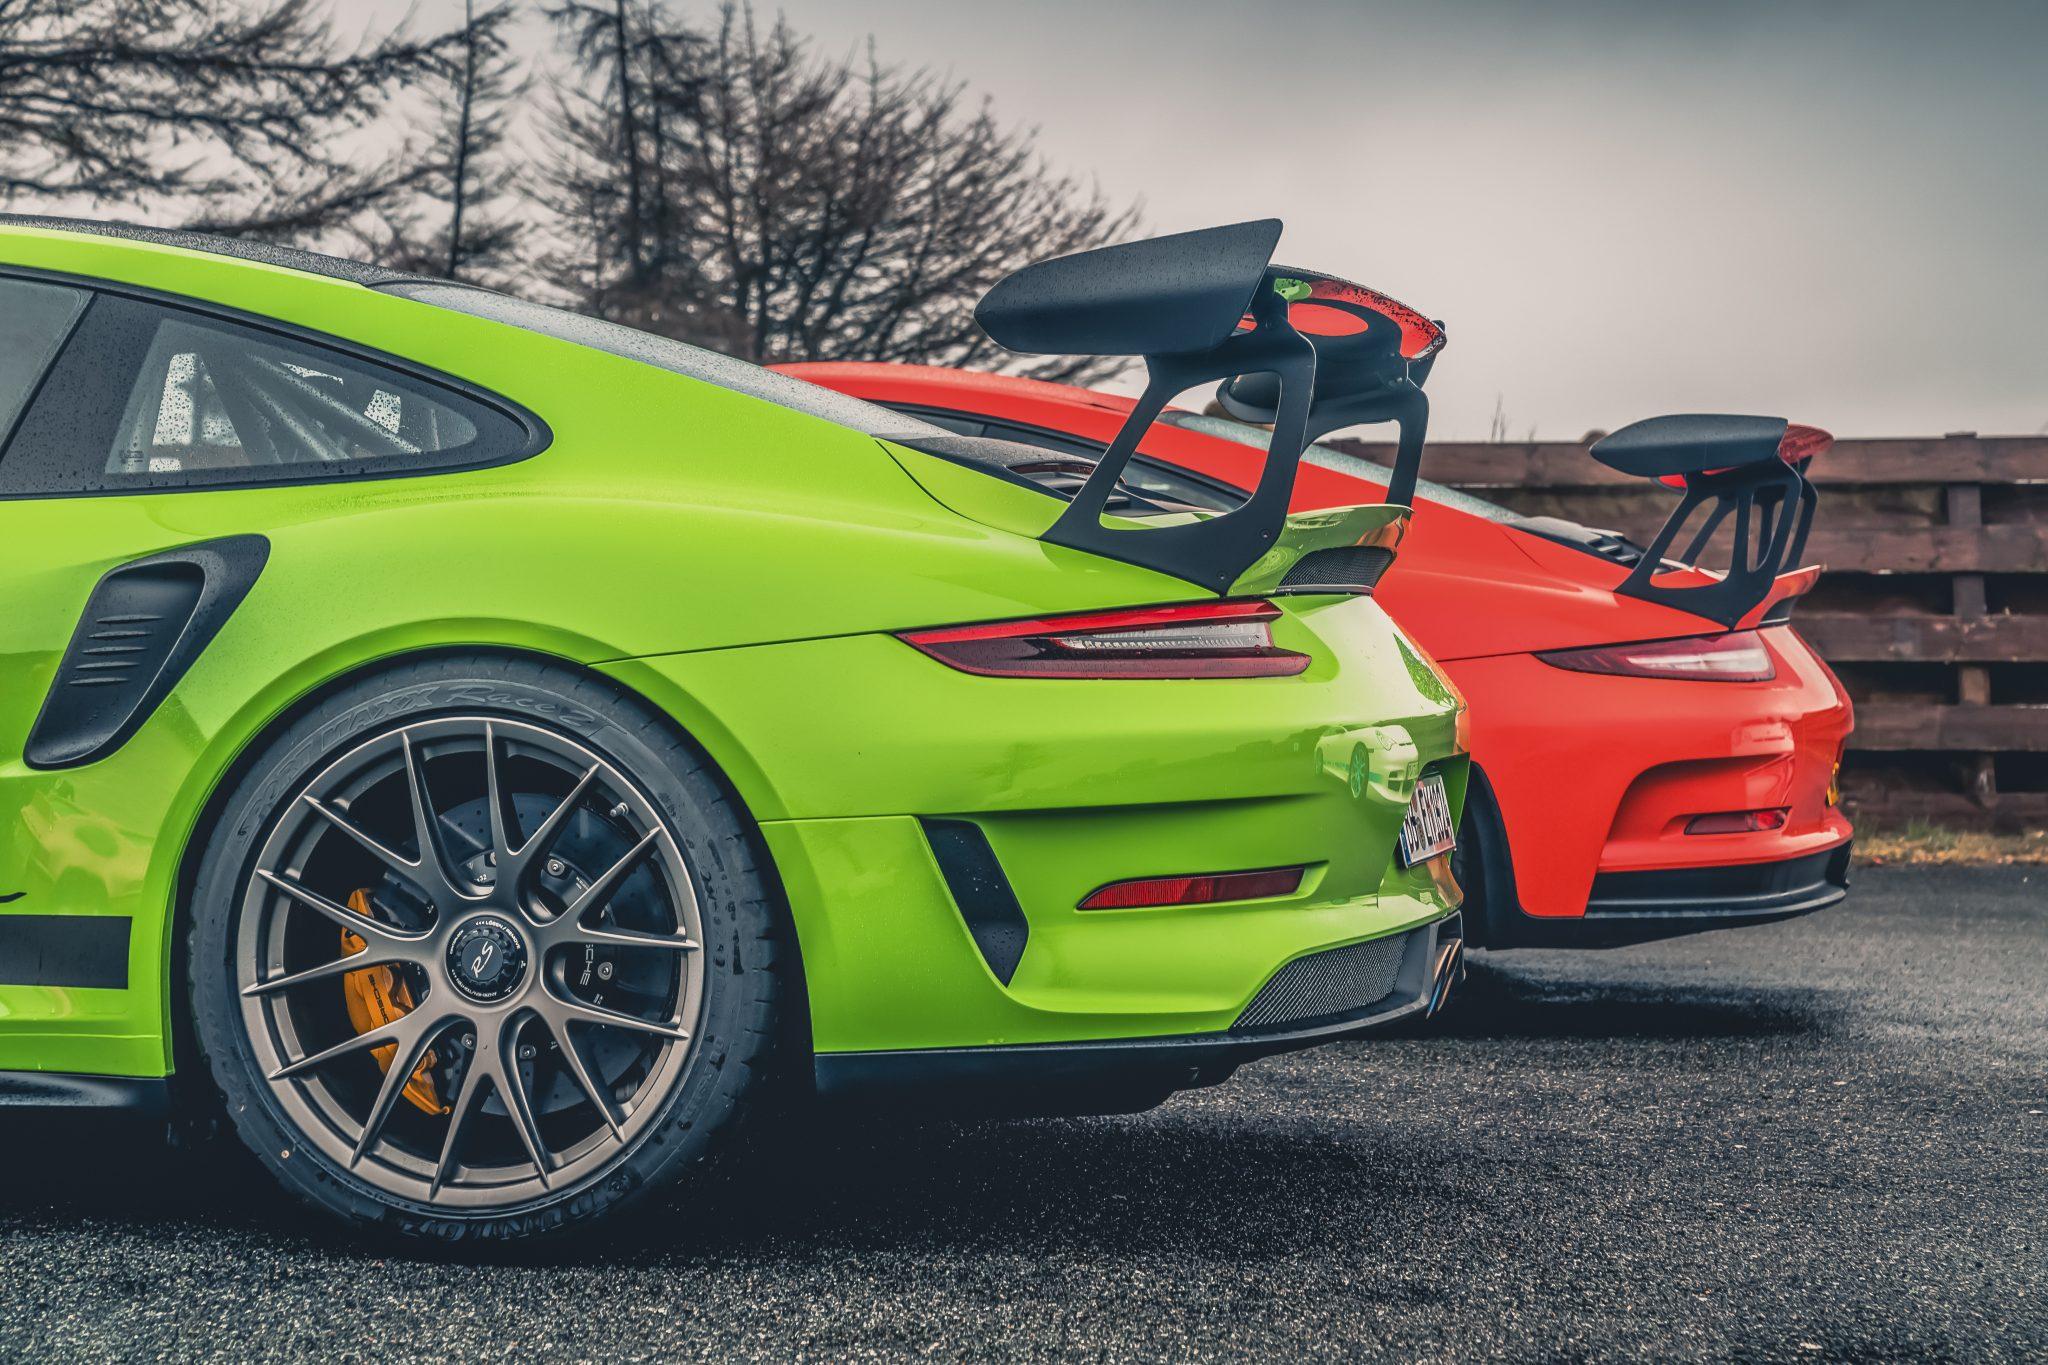 Porsche 911 GT3 RS 991 vs 991.2